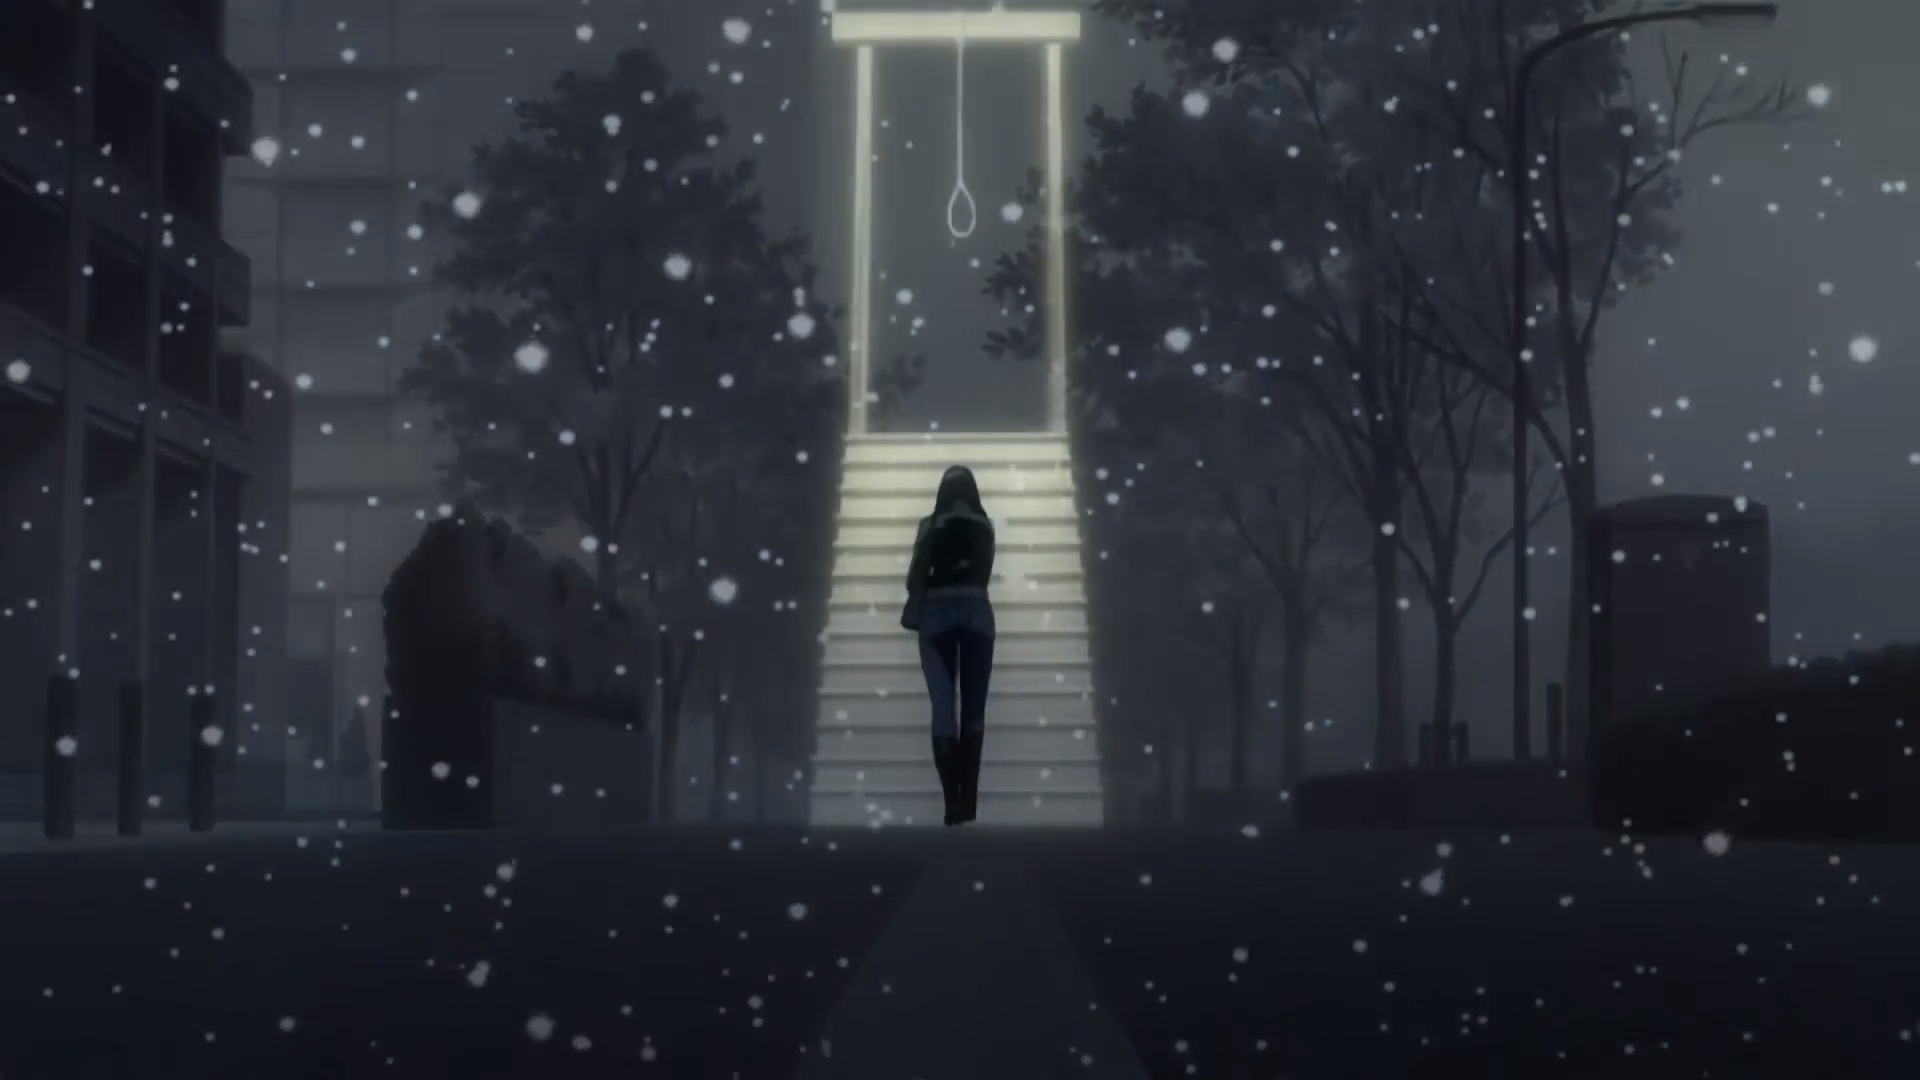 Ficheiro:NomiMisorasDeath(Anime).png